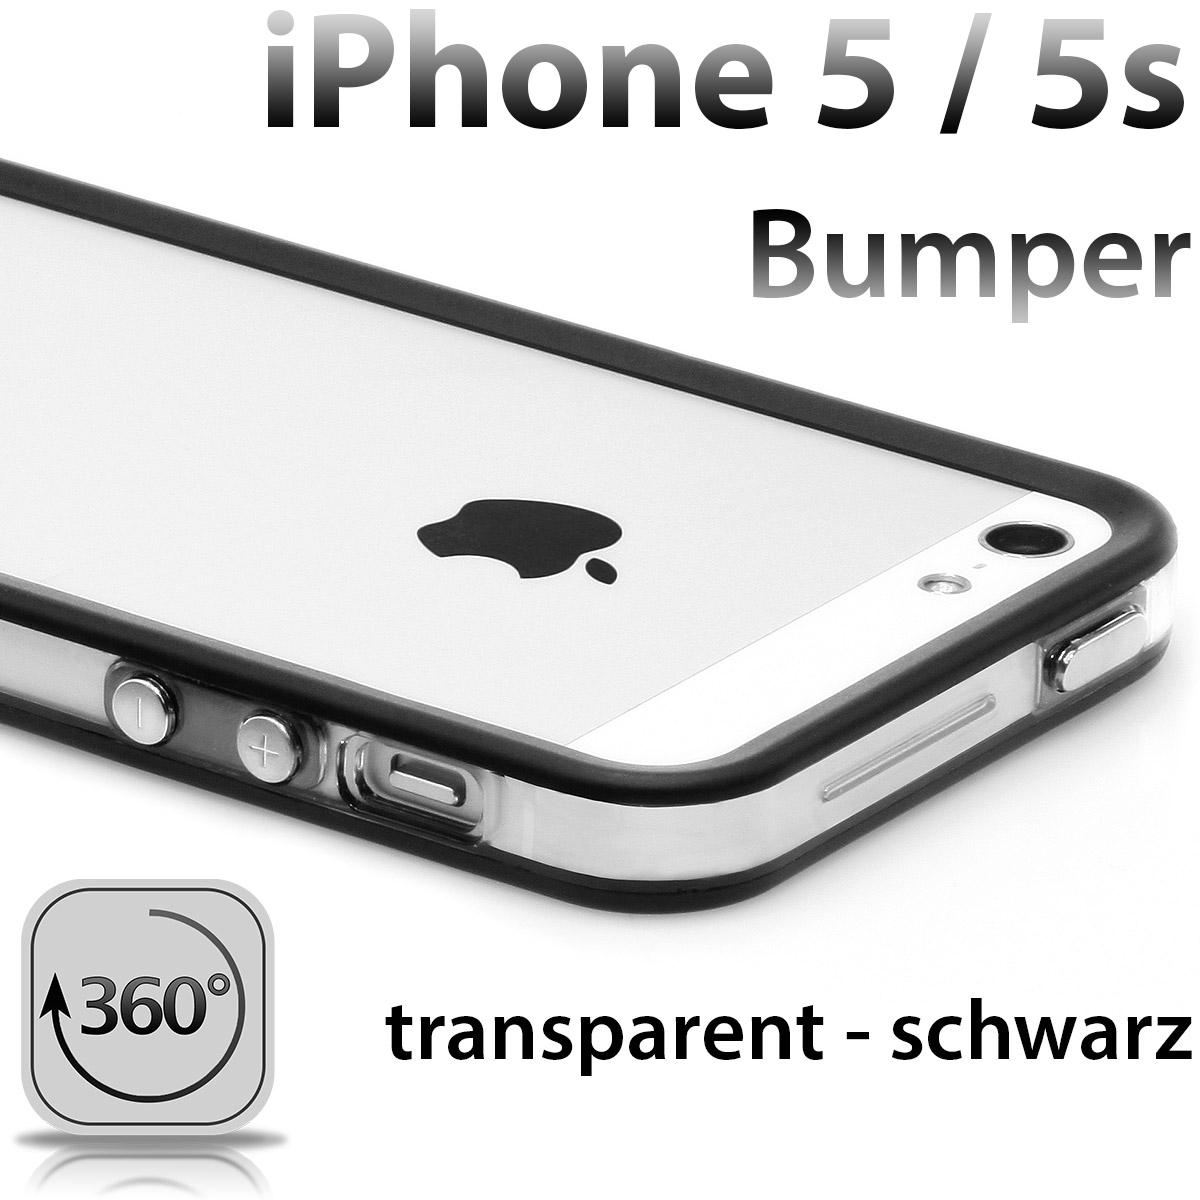 iphone 5 tpu bumper silikon case transparent h lle cover. Black Bedroom Furniture Sets. Home Design Ideas